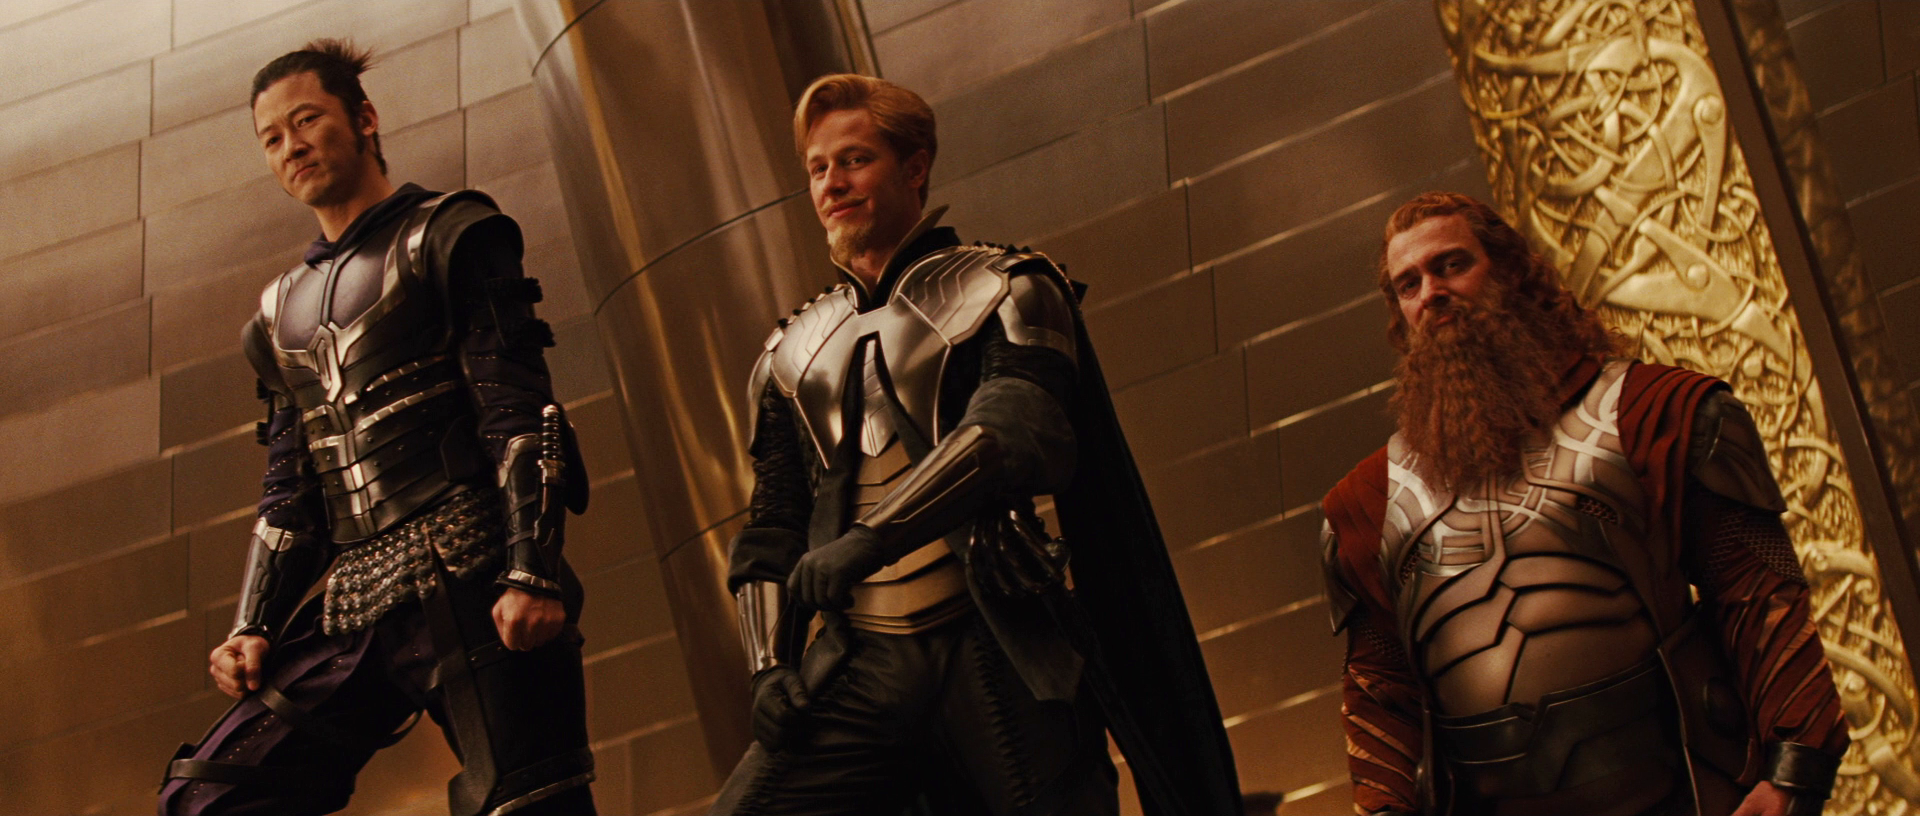 Thor: Ragnarok': Brush-Up On 'The Dark World' Before You See